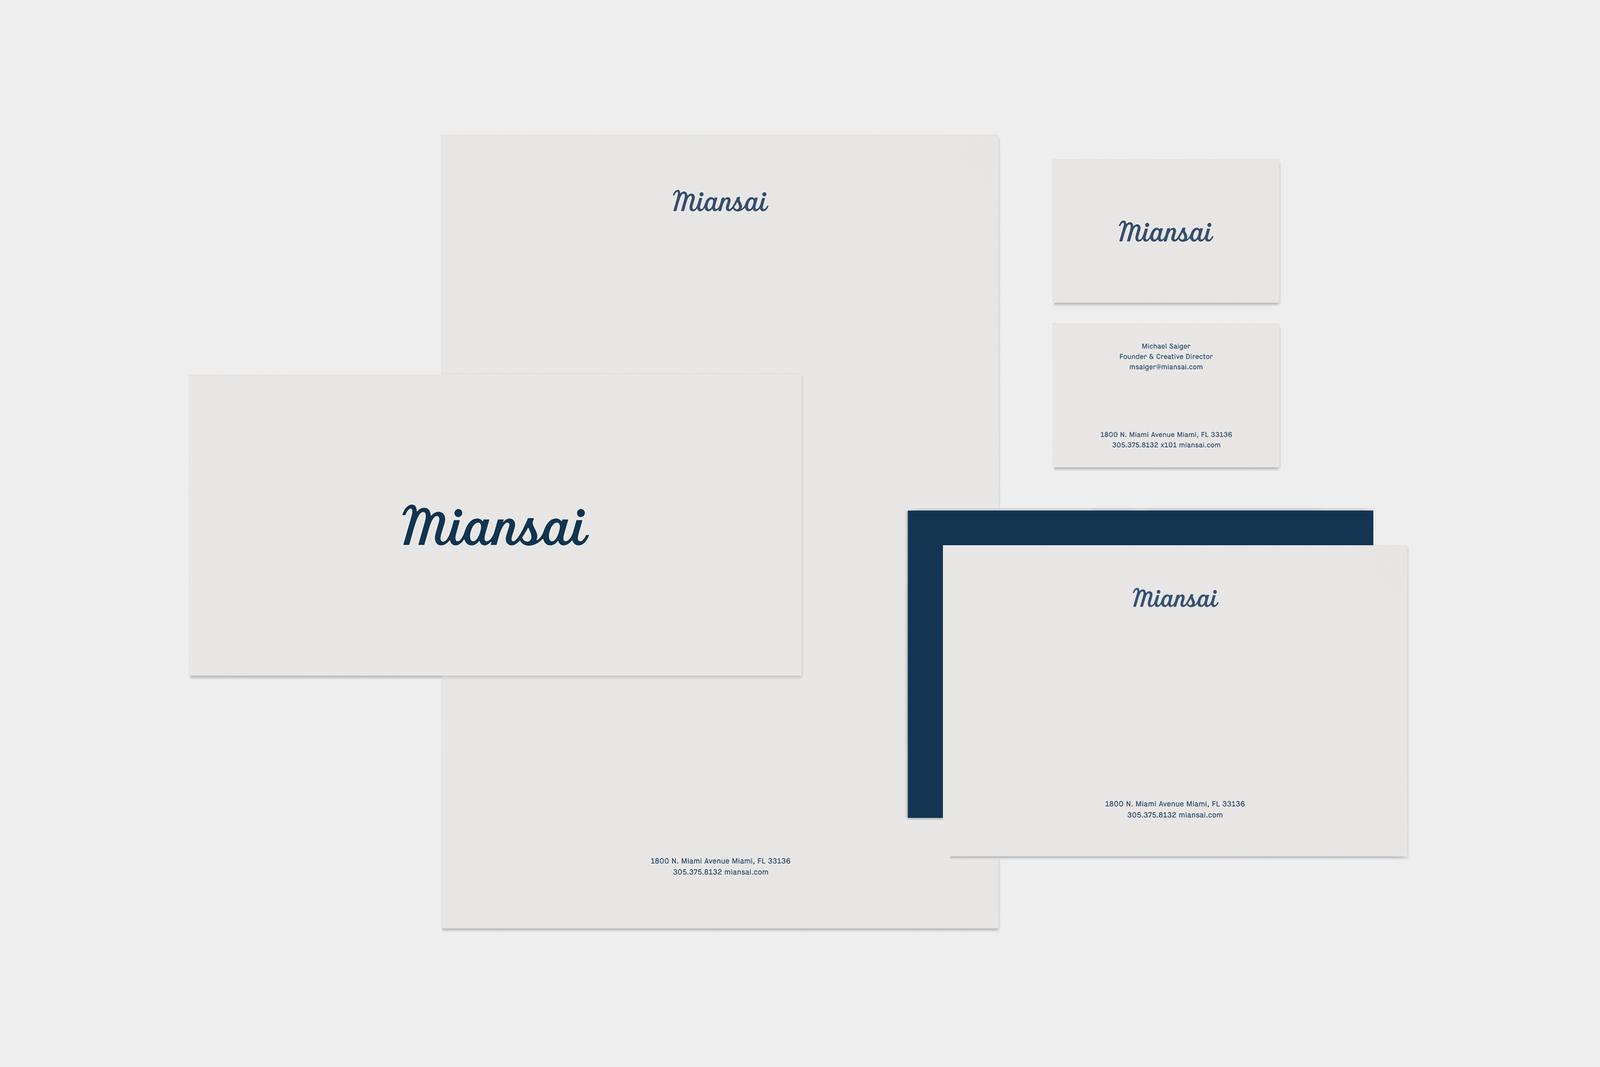 Miansai Identity & Packaging